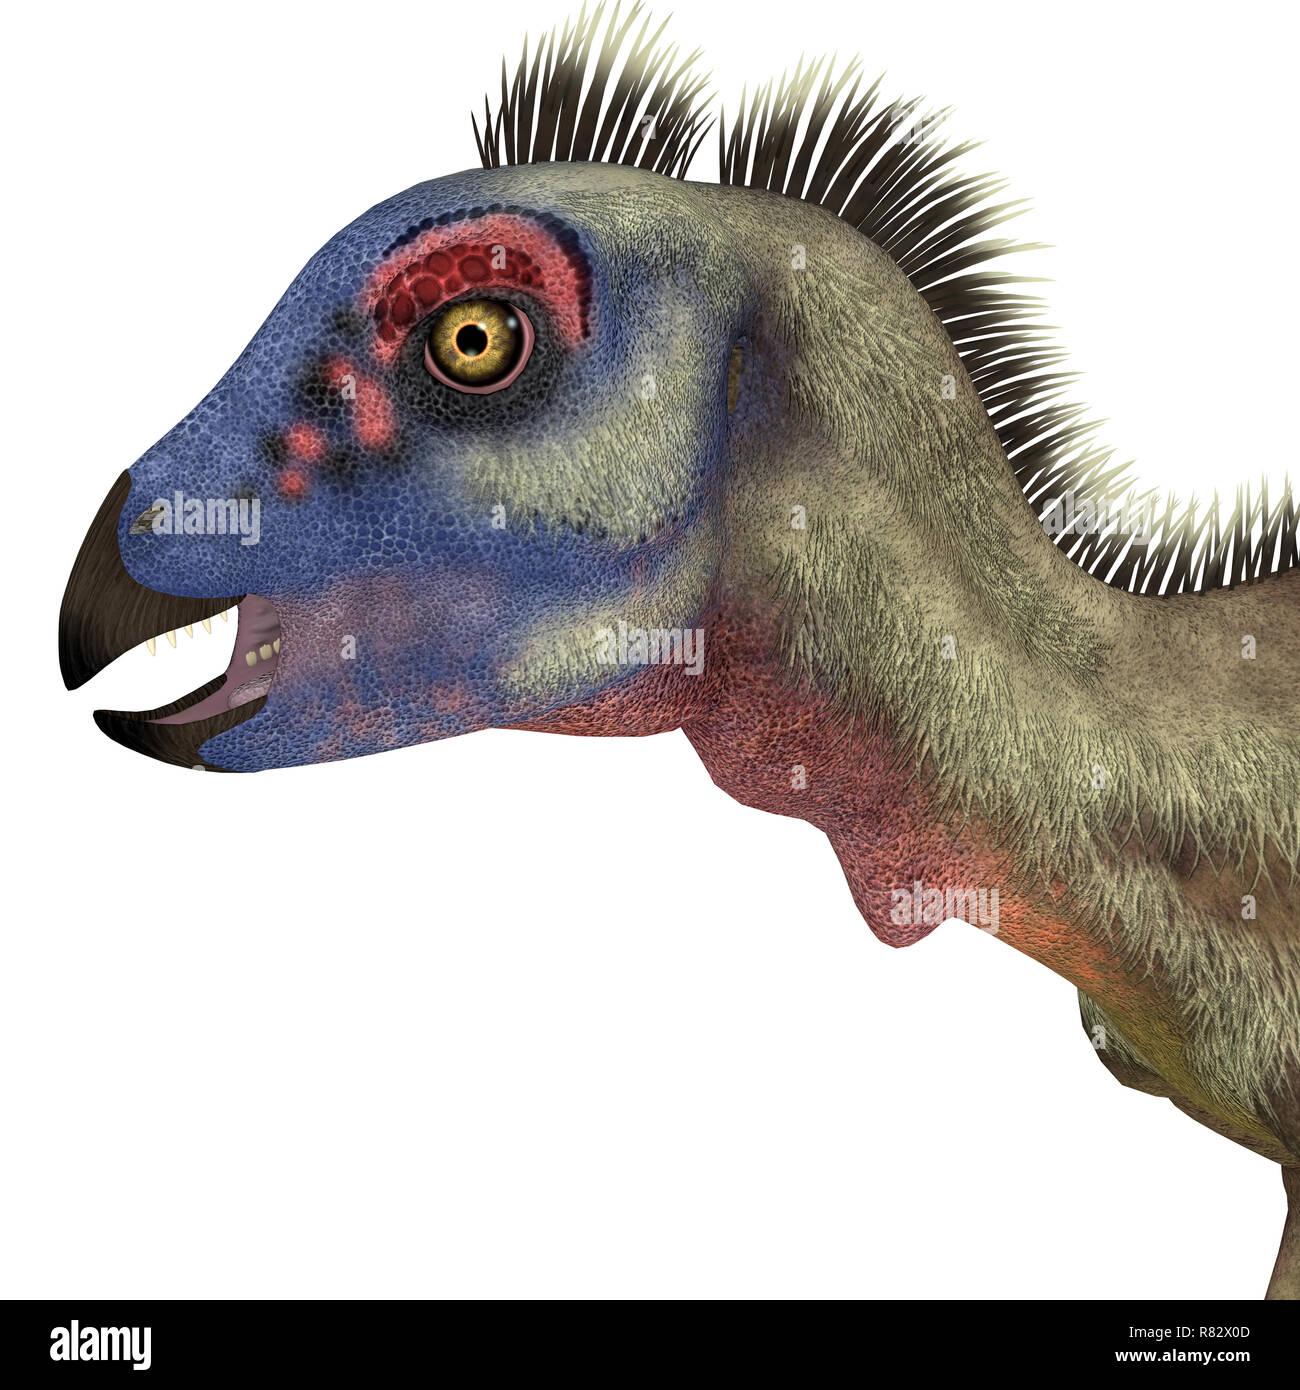 Hypsilophodon Dinosaur Head - Hypsilophodon was a omnivorous ornithopod dinosaur that lived in England during the Cretaceous Period. - Stock Image